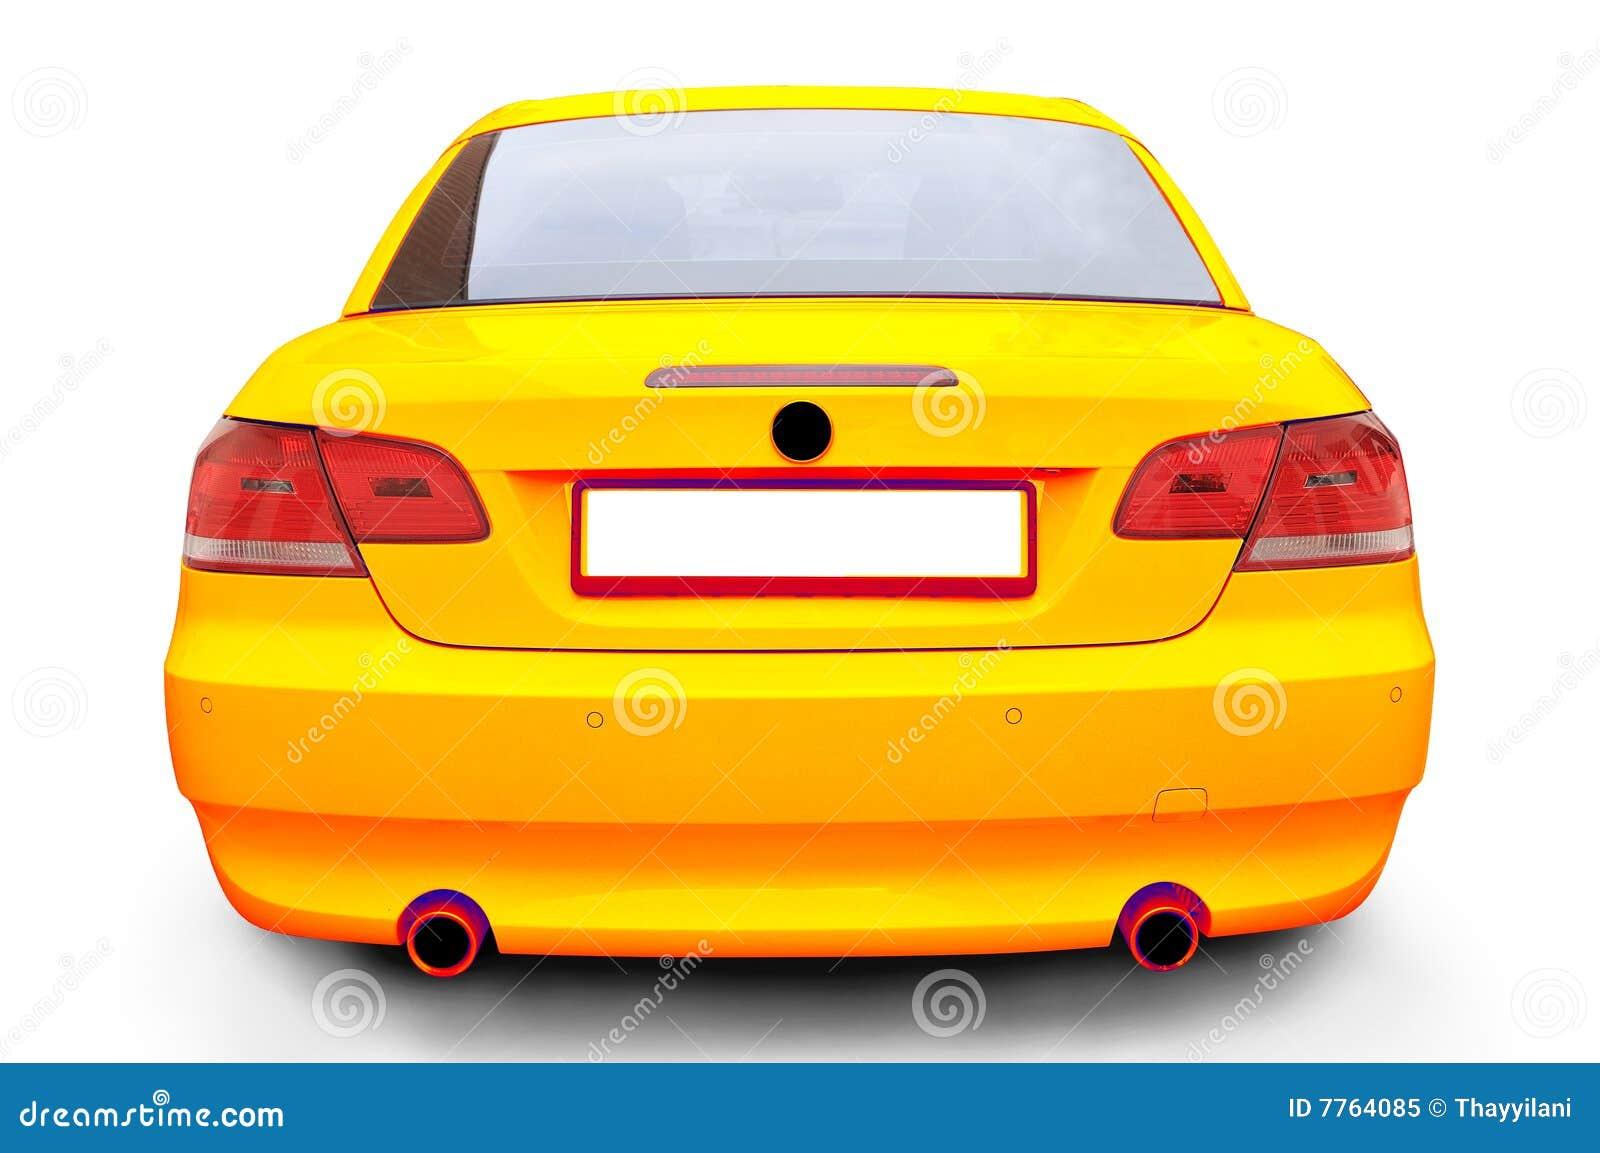 Yellow Bmw 335i Convertible Car Royalty Free Stock Photo Image 7764085